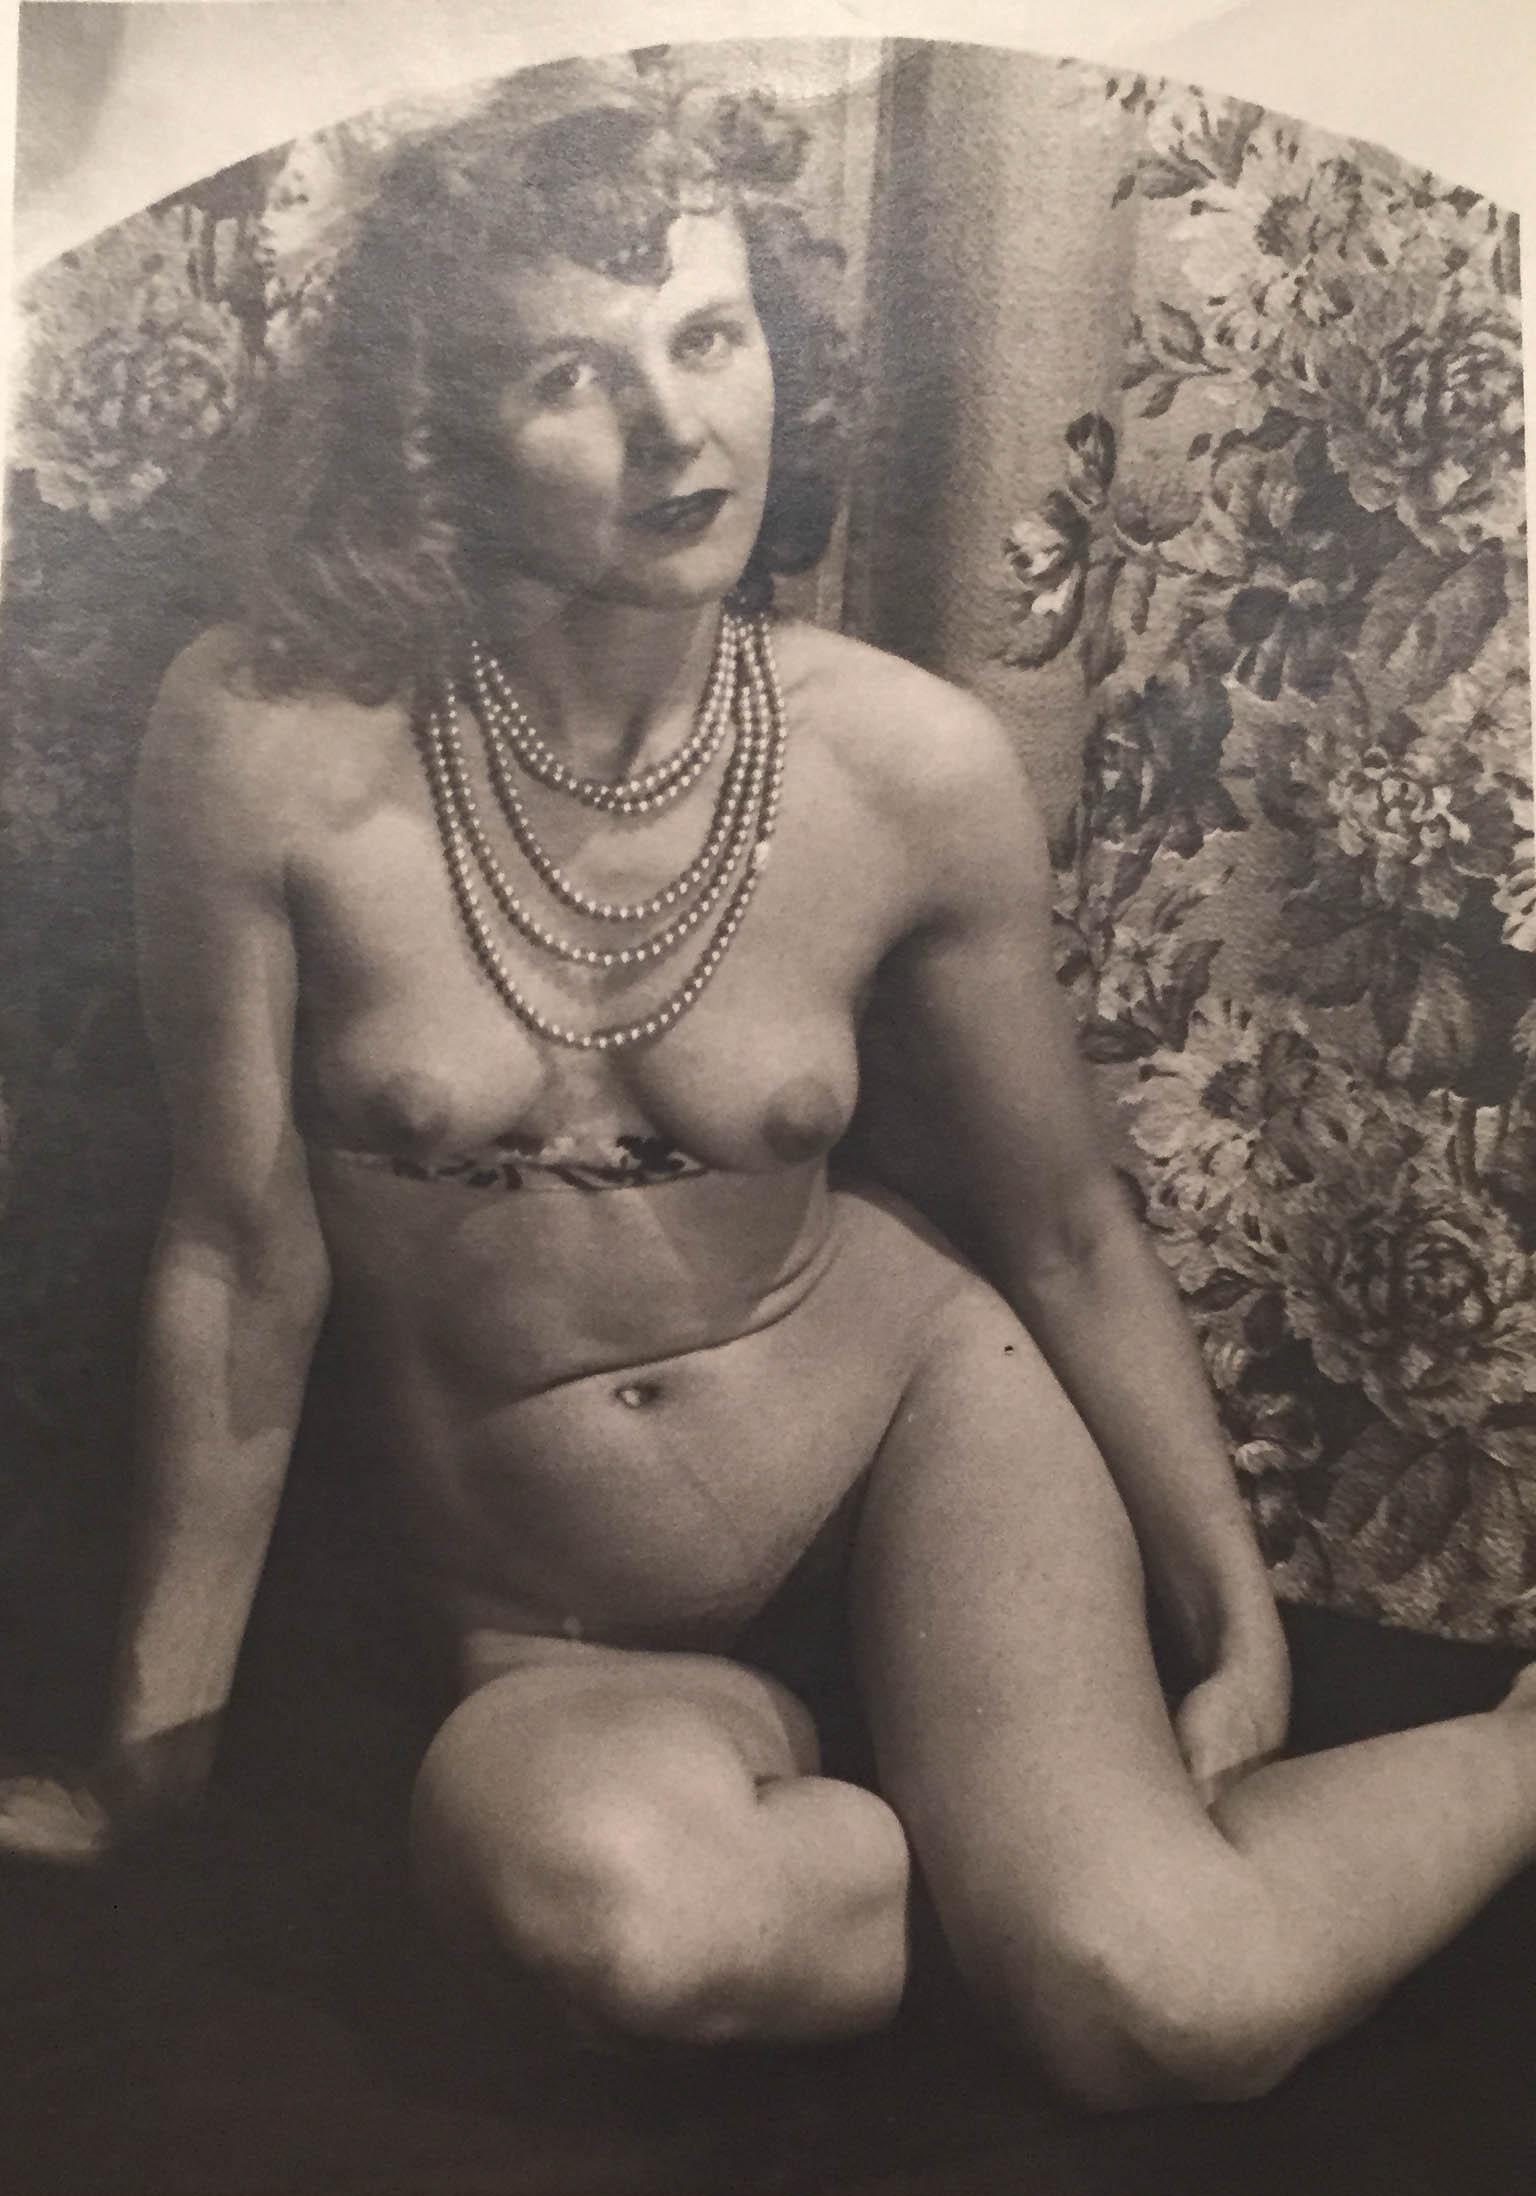 Untitled , 1940-50 Silver Gelatin Print 4 1/2 x 6 1/2 in.